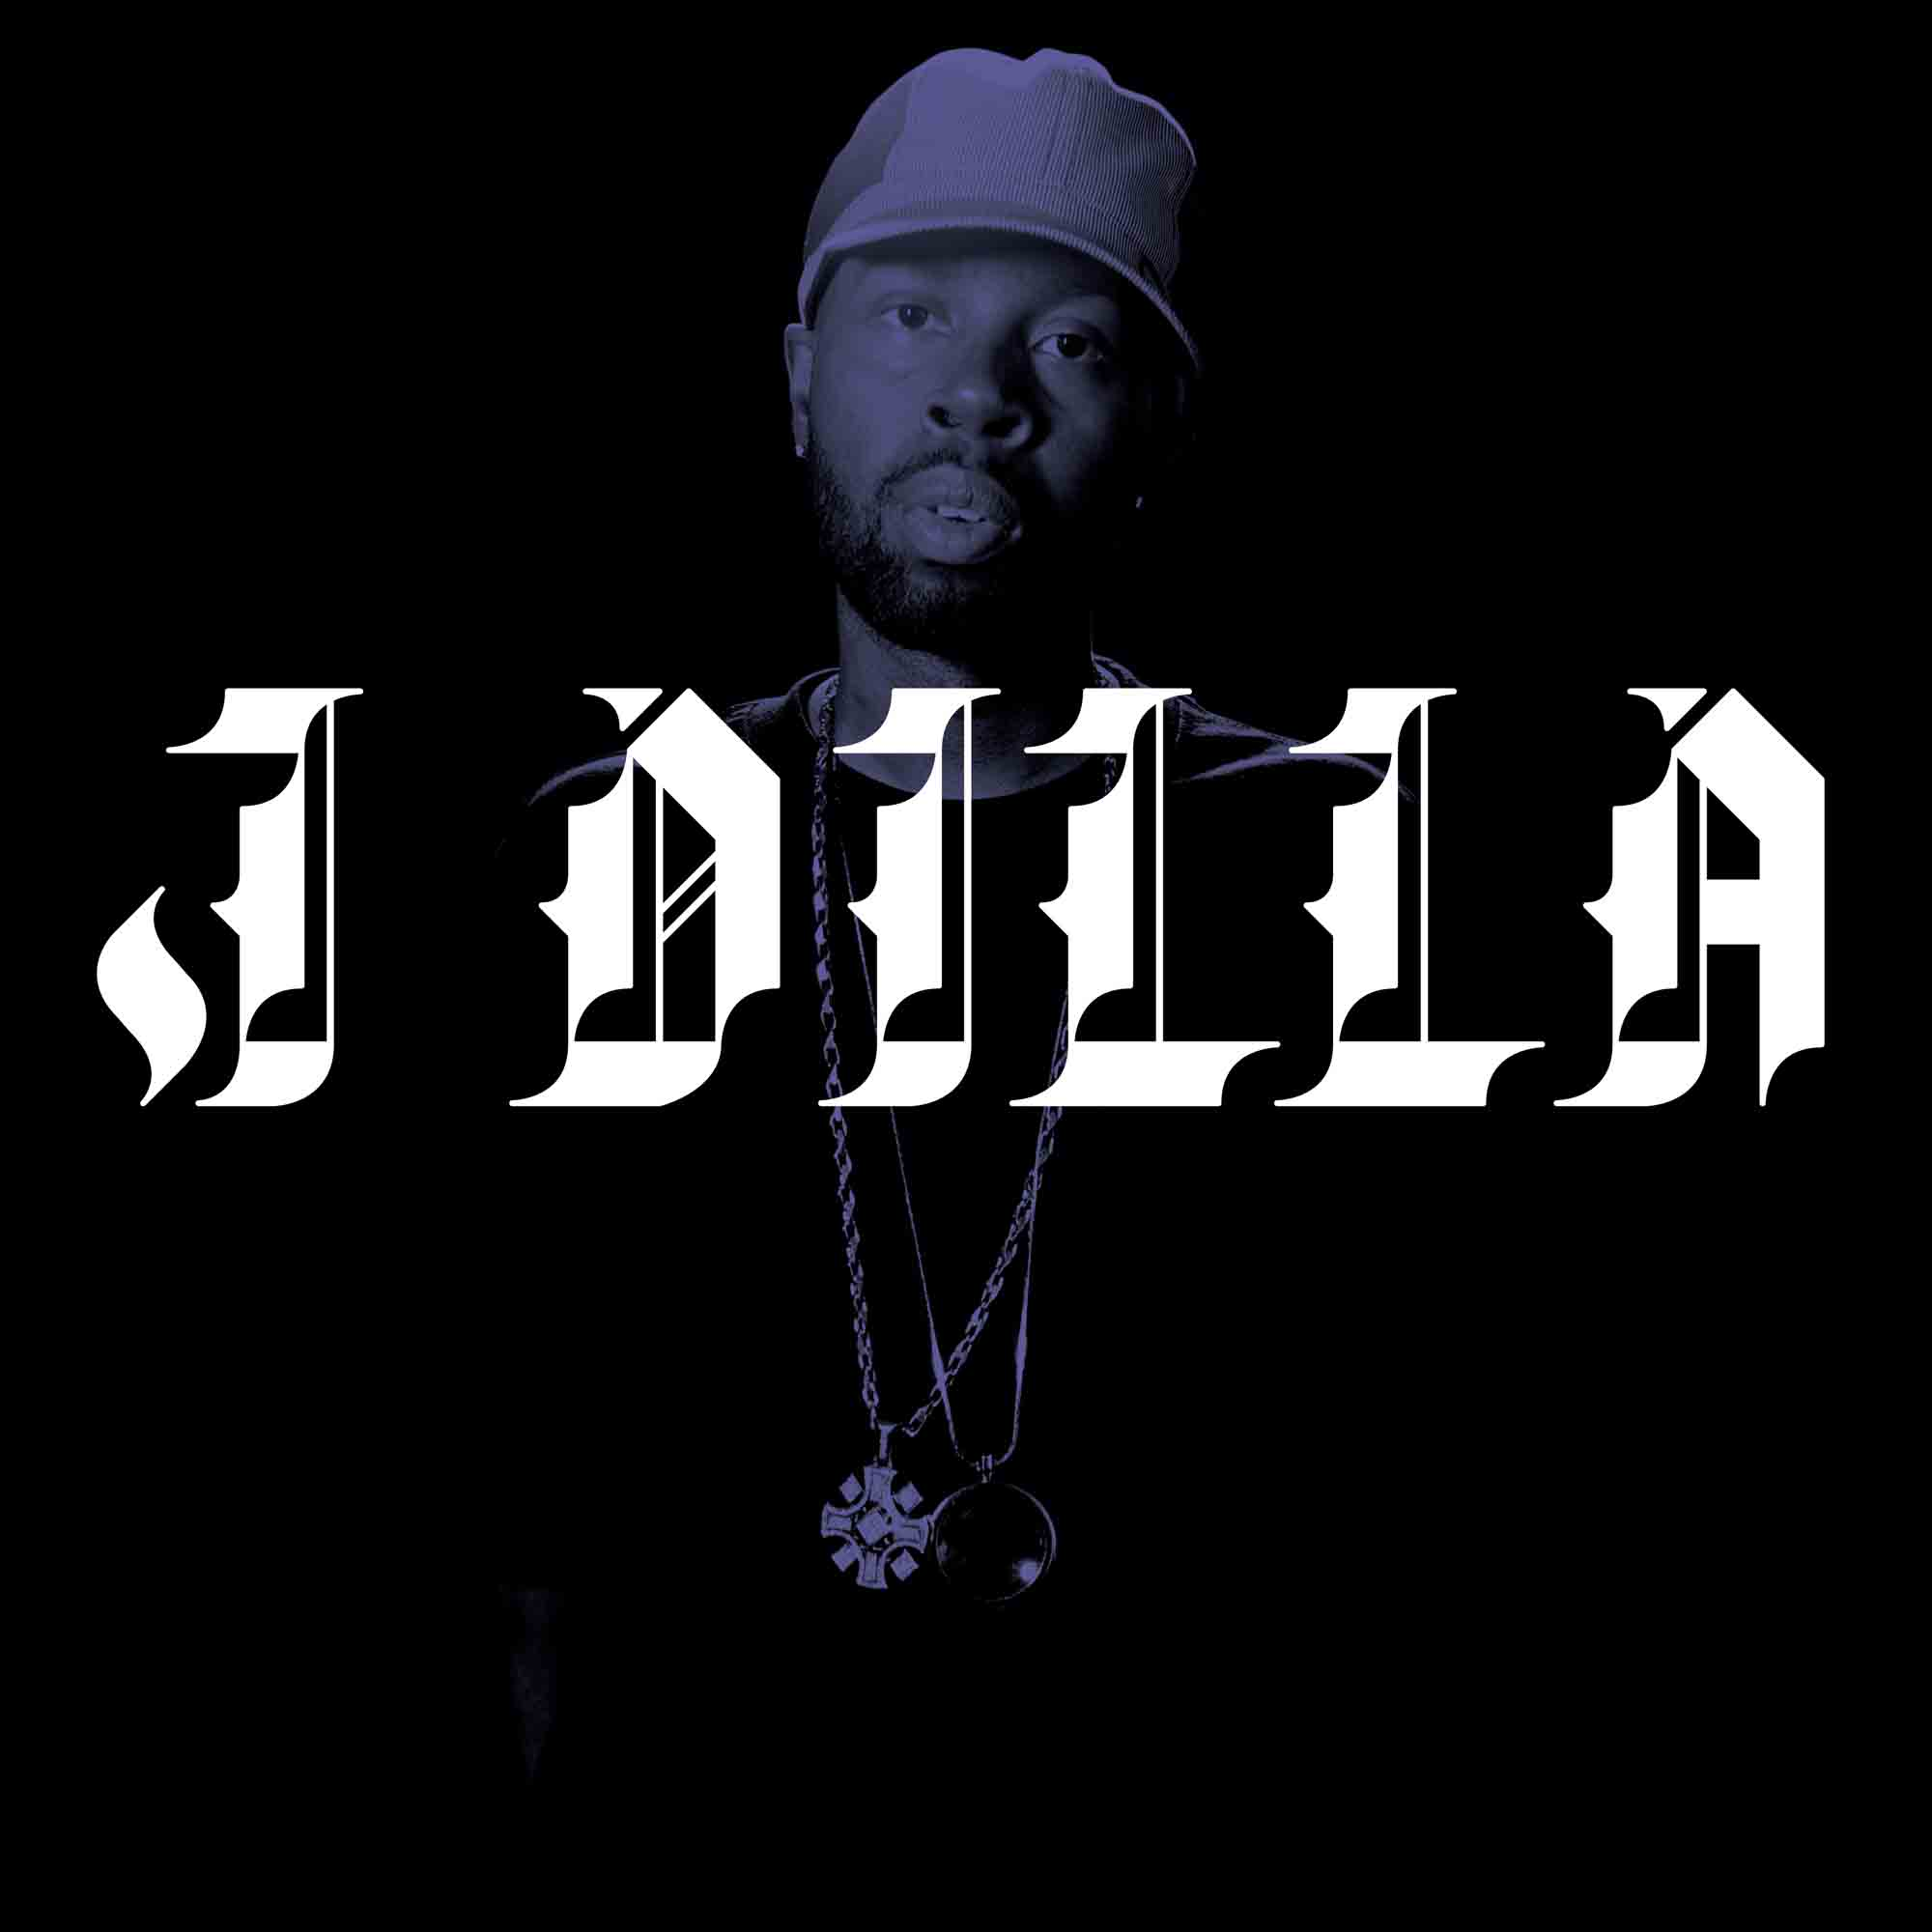 DILLA-300DPI.jpg